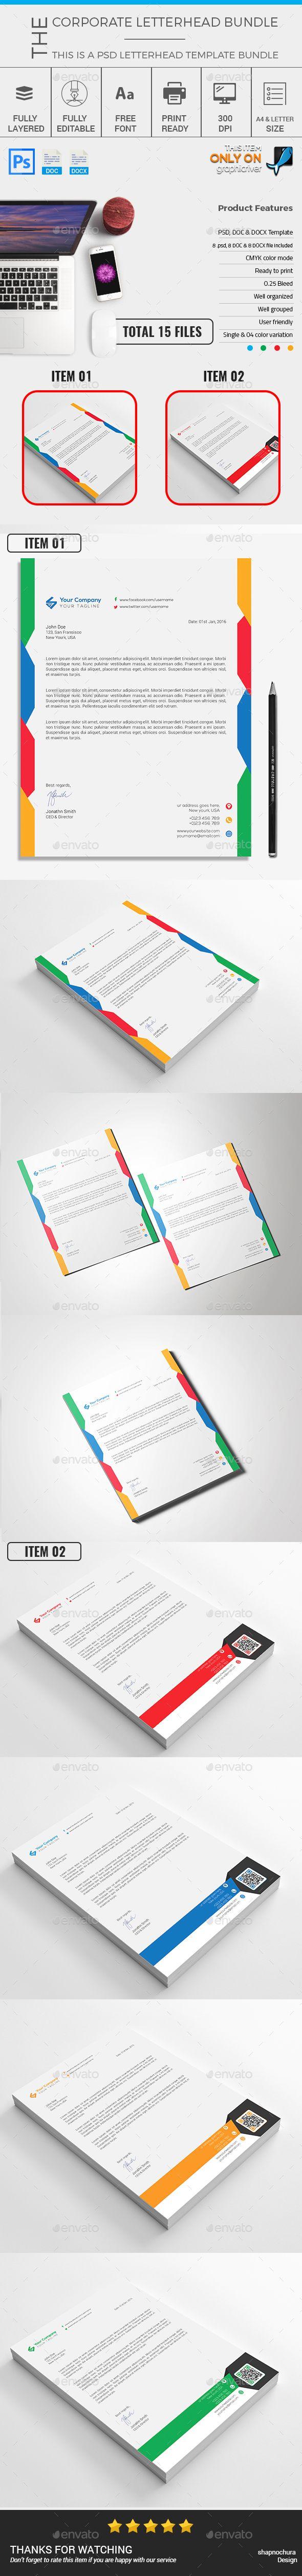 Letterhead Templates PSD MS Word Bundle 26